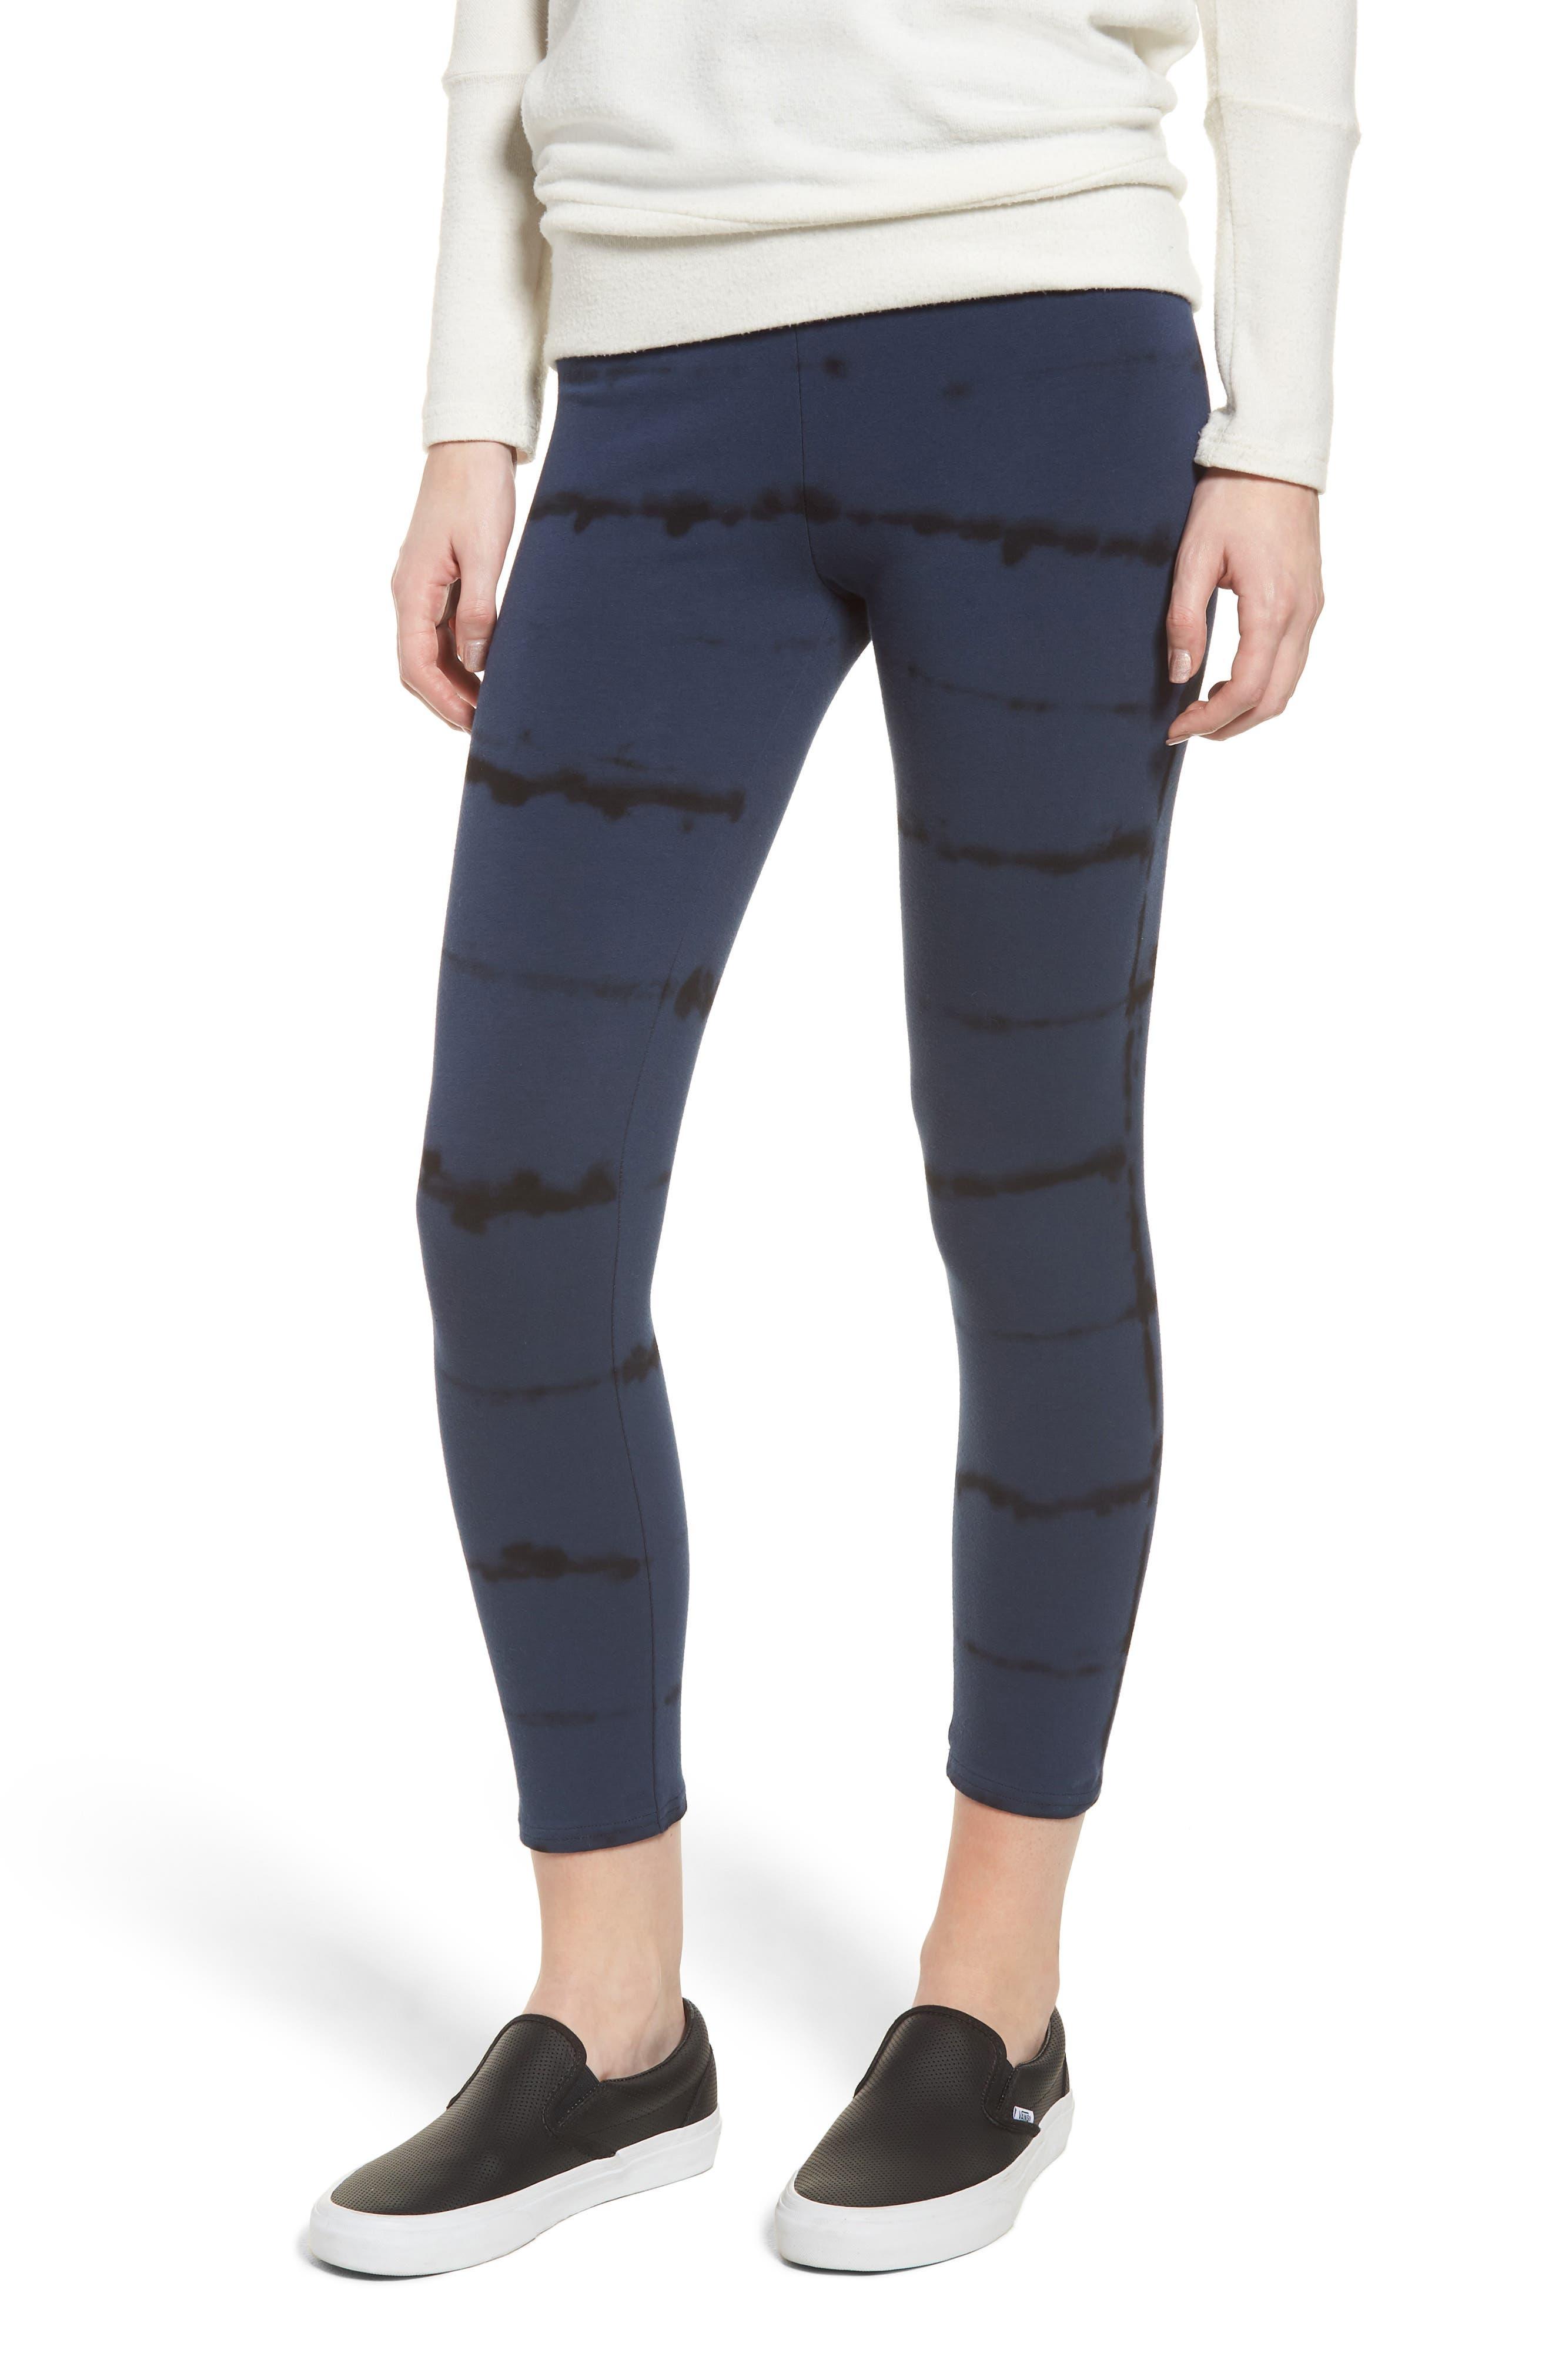 Nordstrom High Waist Crop Leggings, Blue